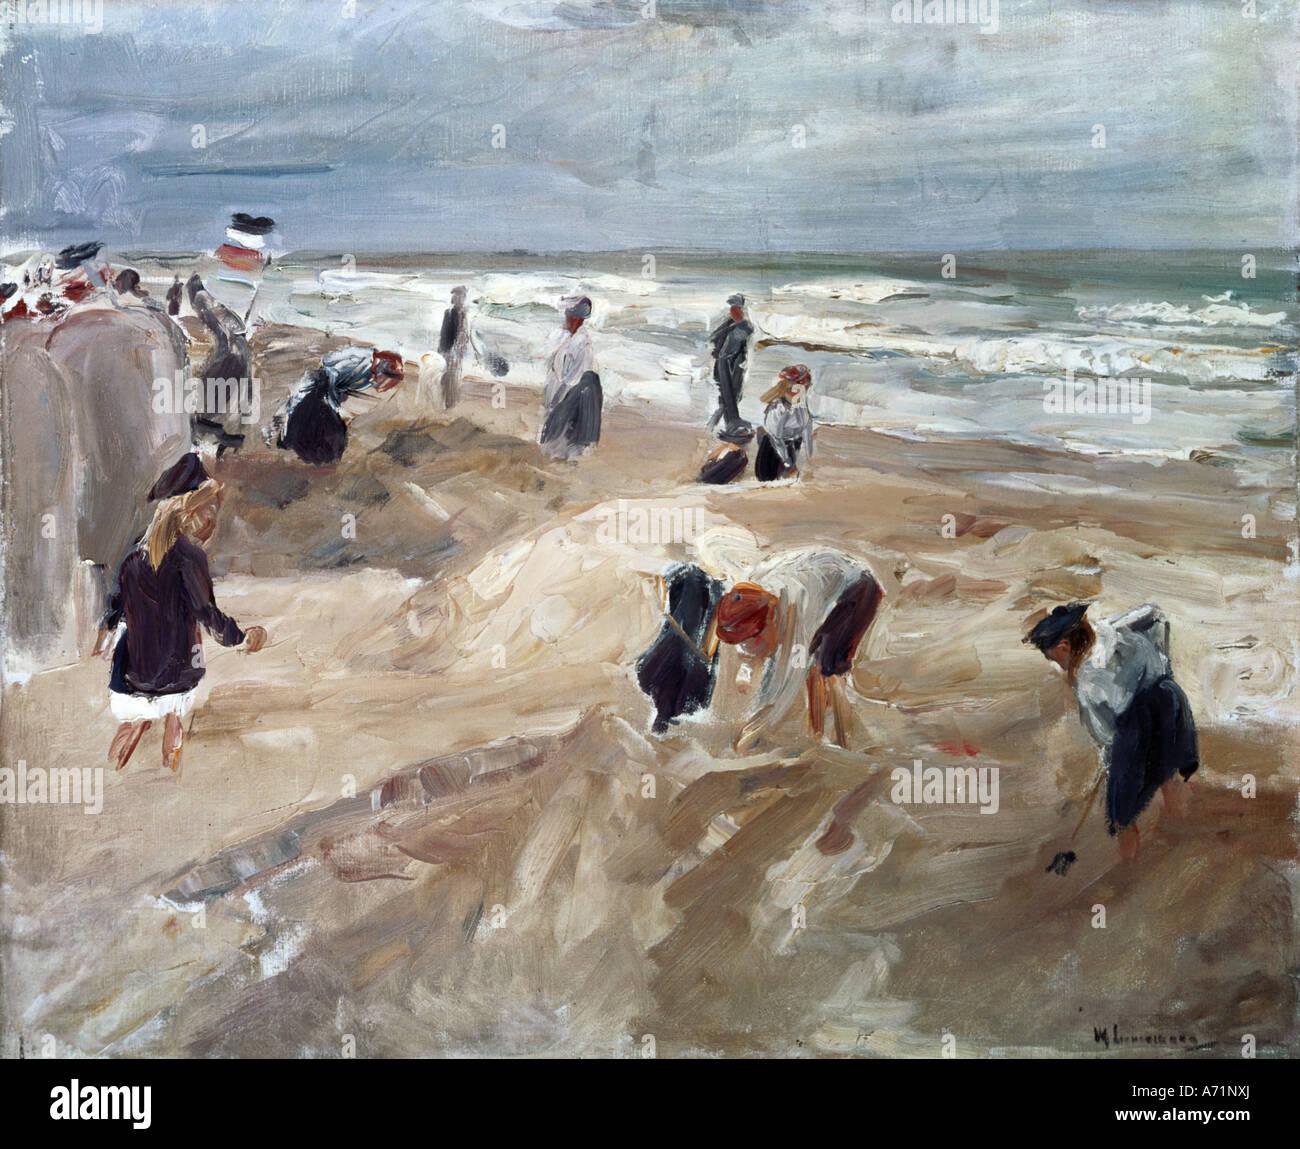 'Fine Arts, Liebermann, Max, (1847 - 1935), peinture, 'trandszene à Noordwijk', ('scène Photo Stock